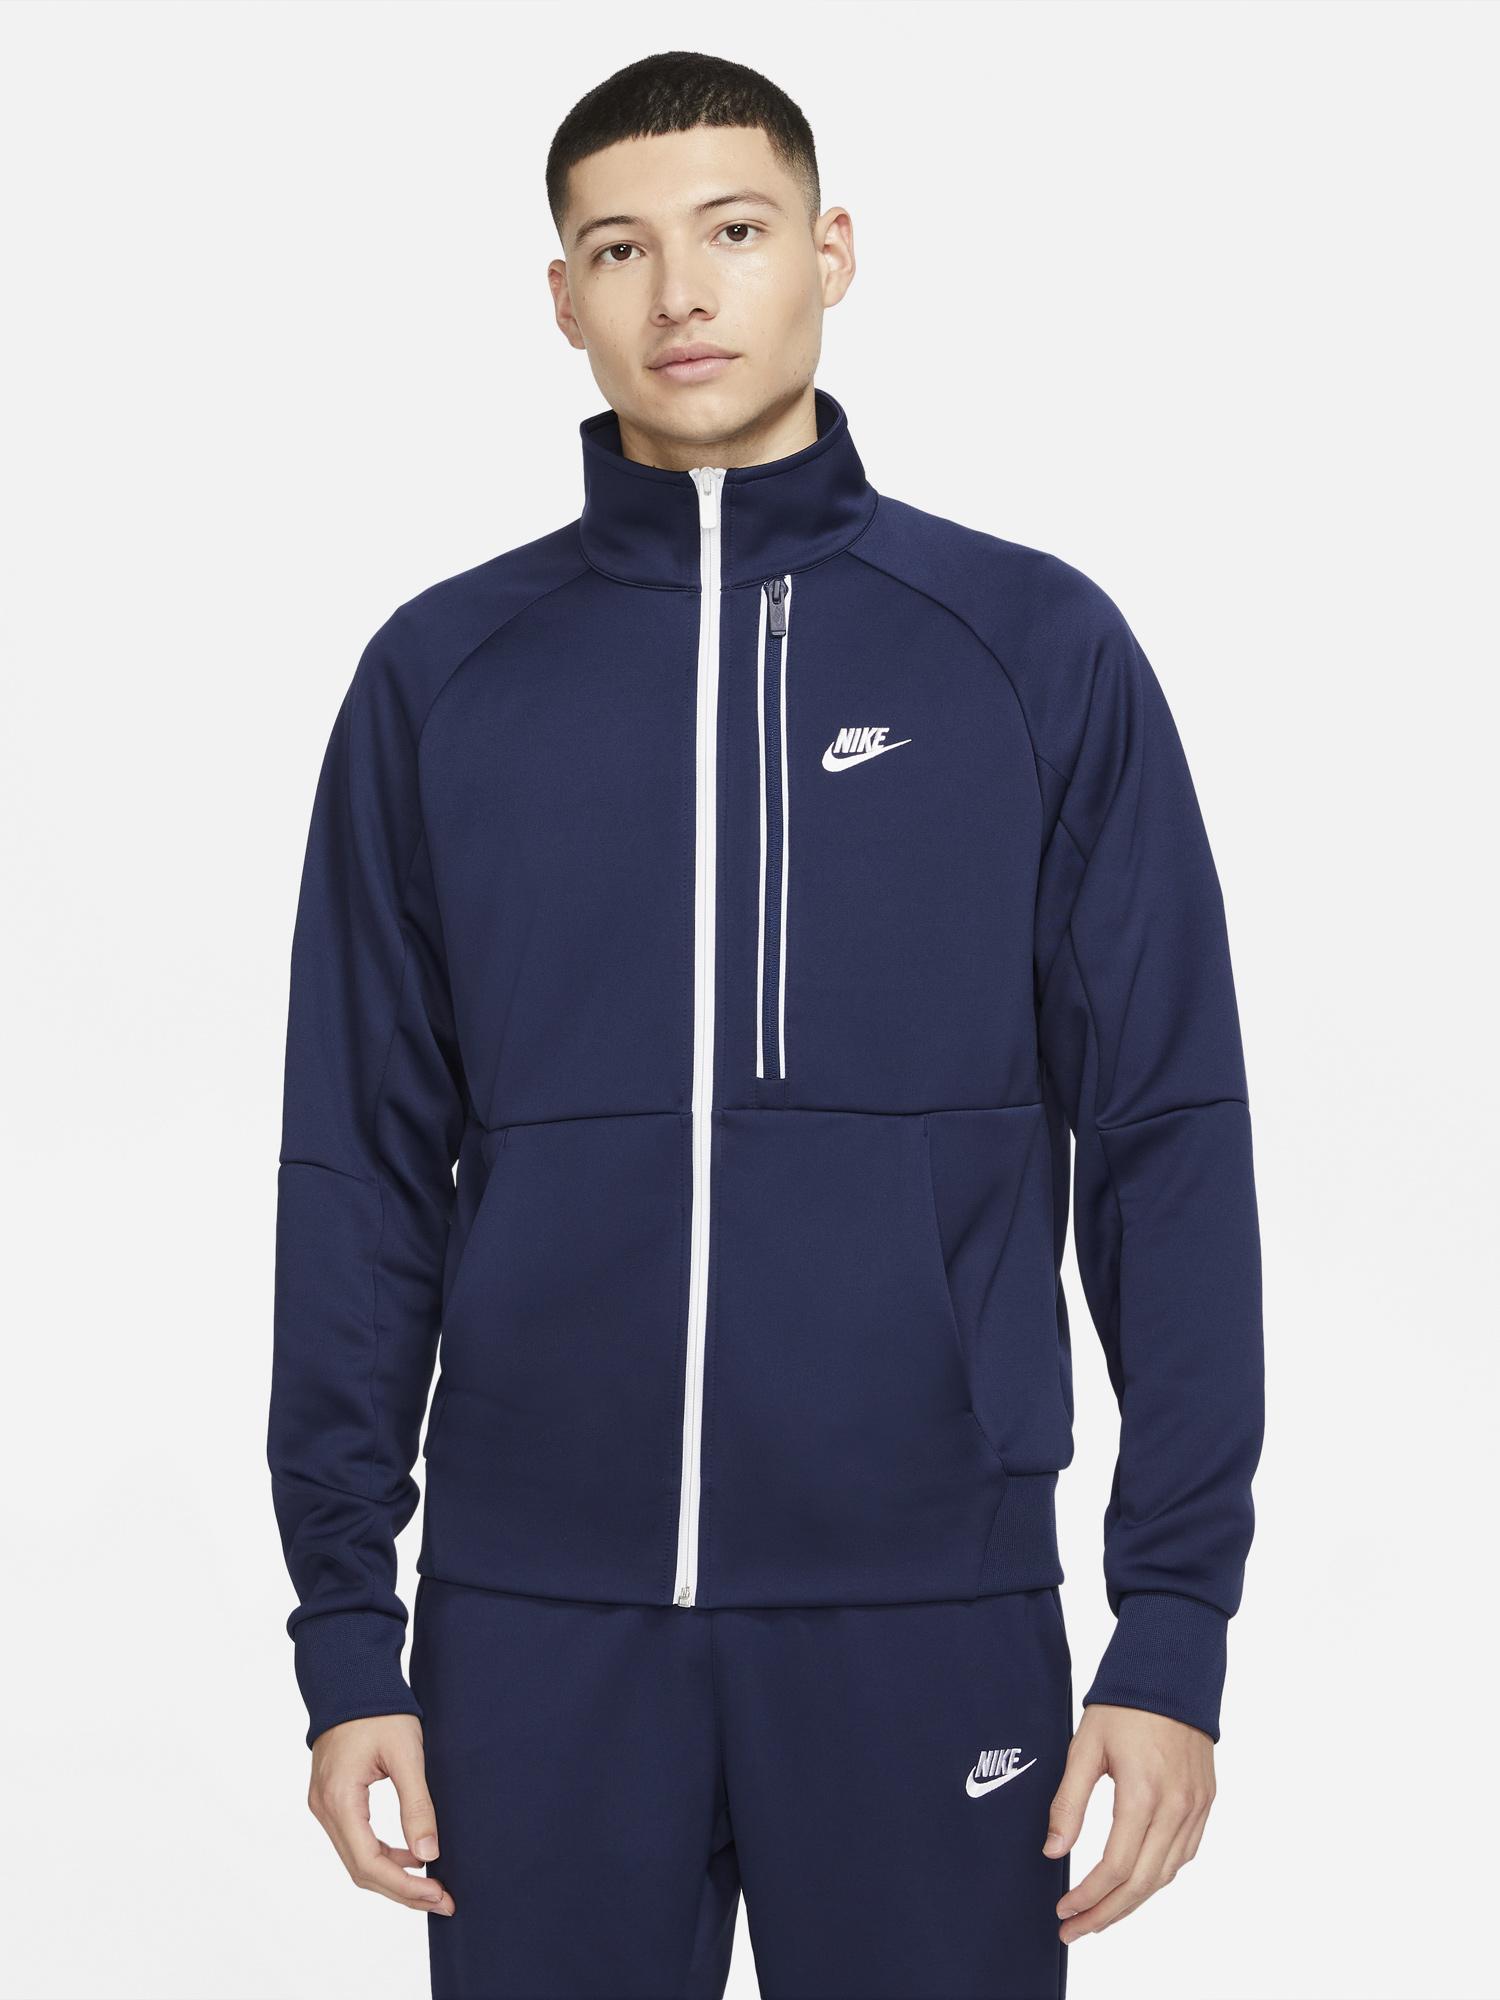 nike-midnight-navy-track-jacket